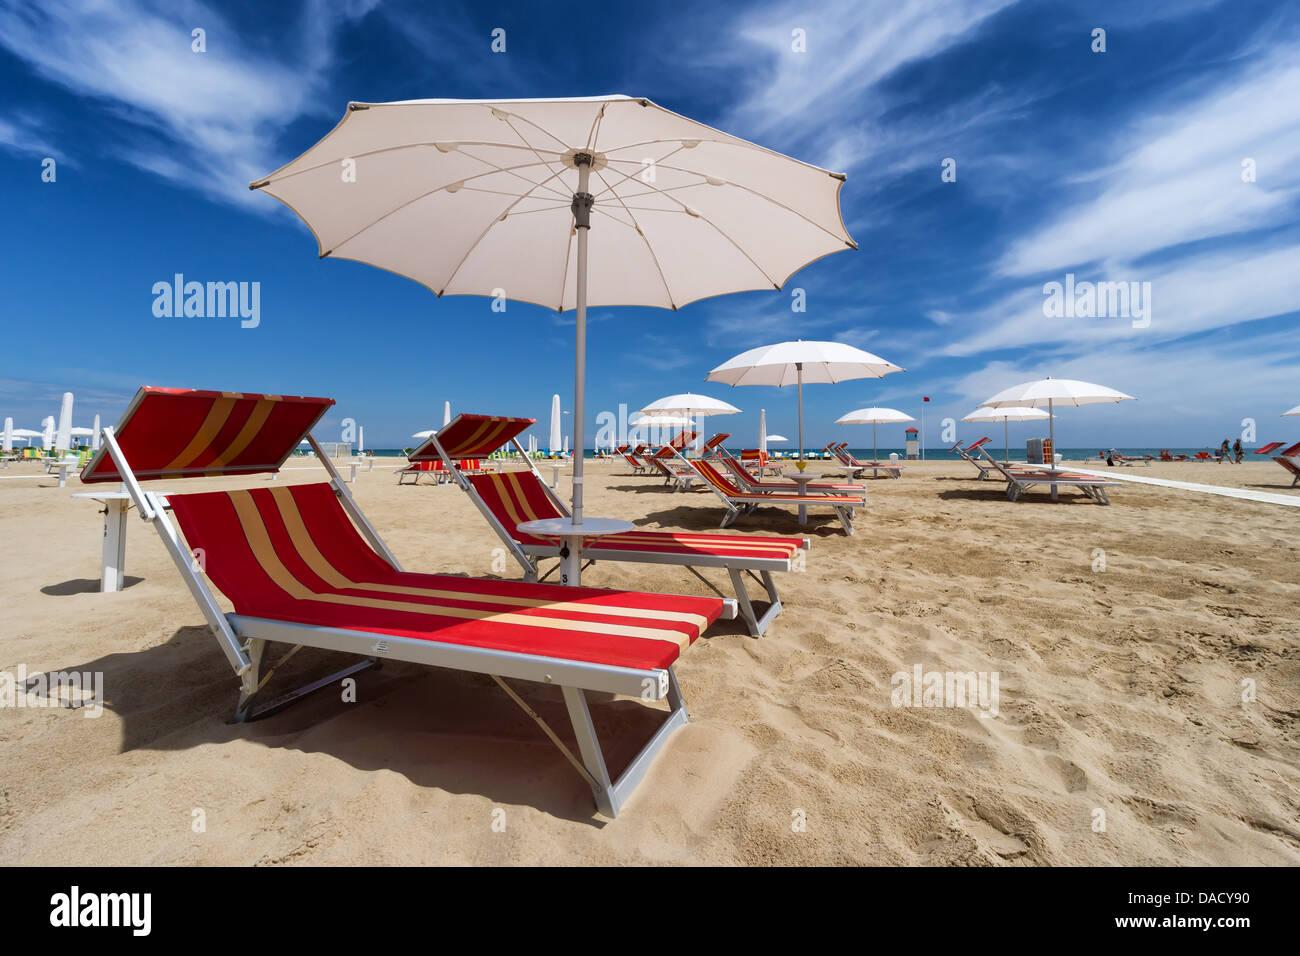 sonnenschirme und sonnenliegen in rimini und riccione strand italien stockfoto bild 58062508. Black Bedroom Furniture Sets. Home Design Ideas